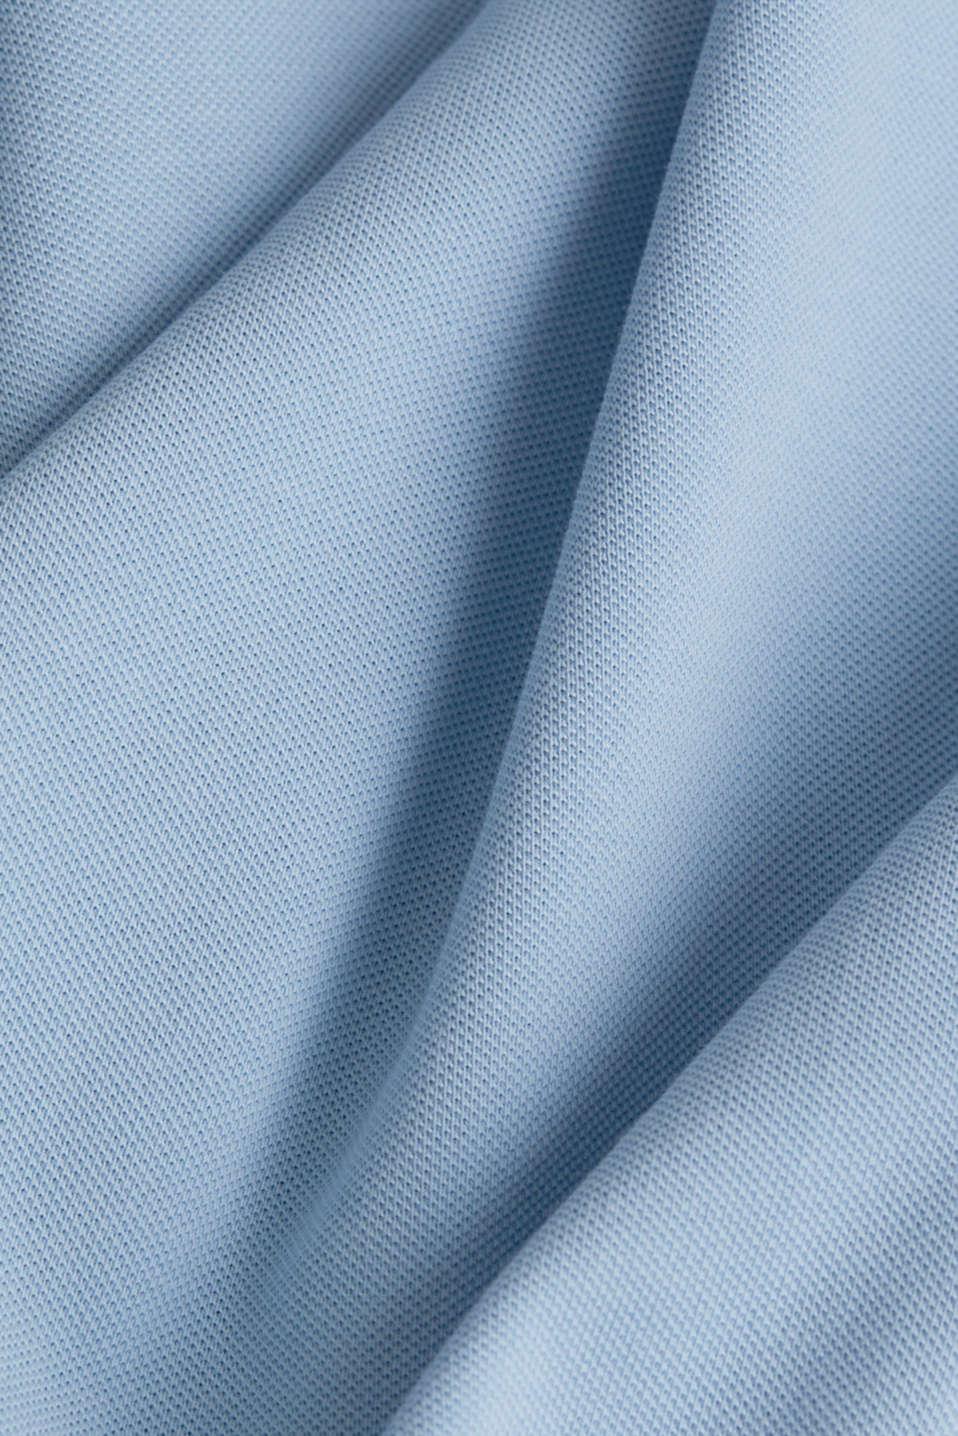 Piqué polo shirt in 100% cotton, LIGHT BLUE, detail image number 4